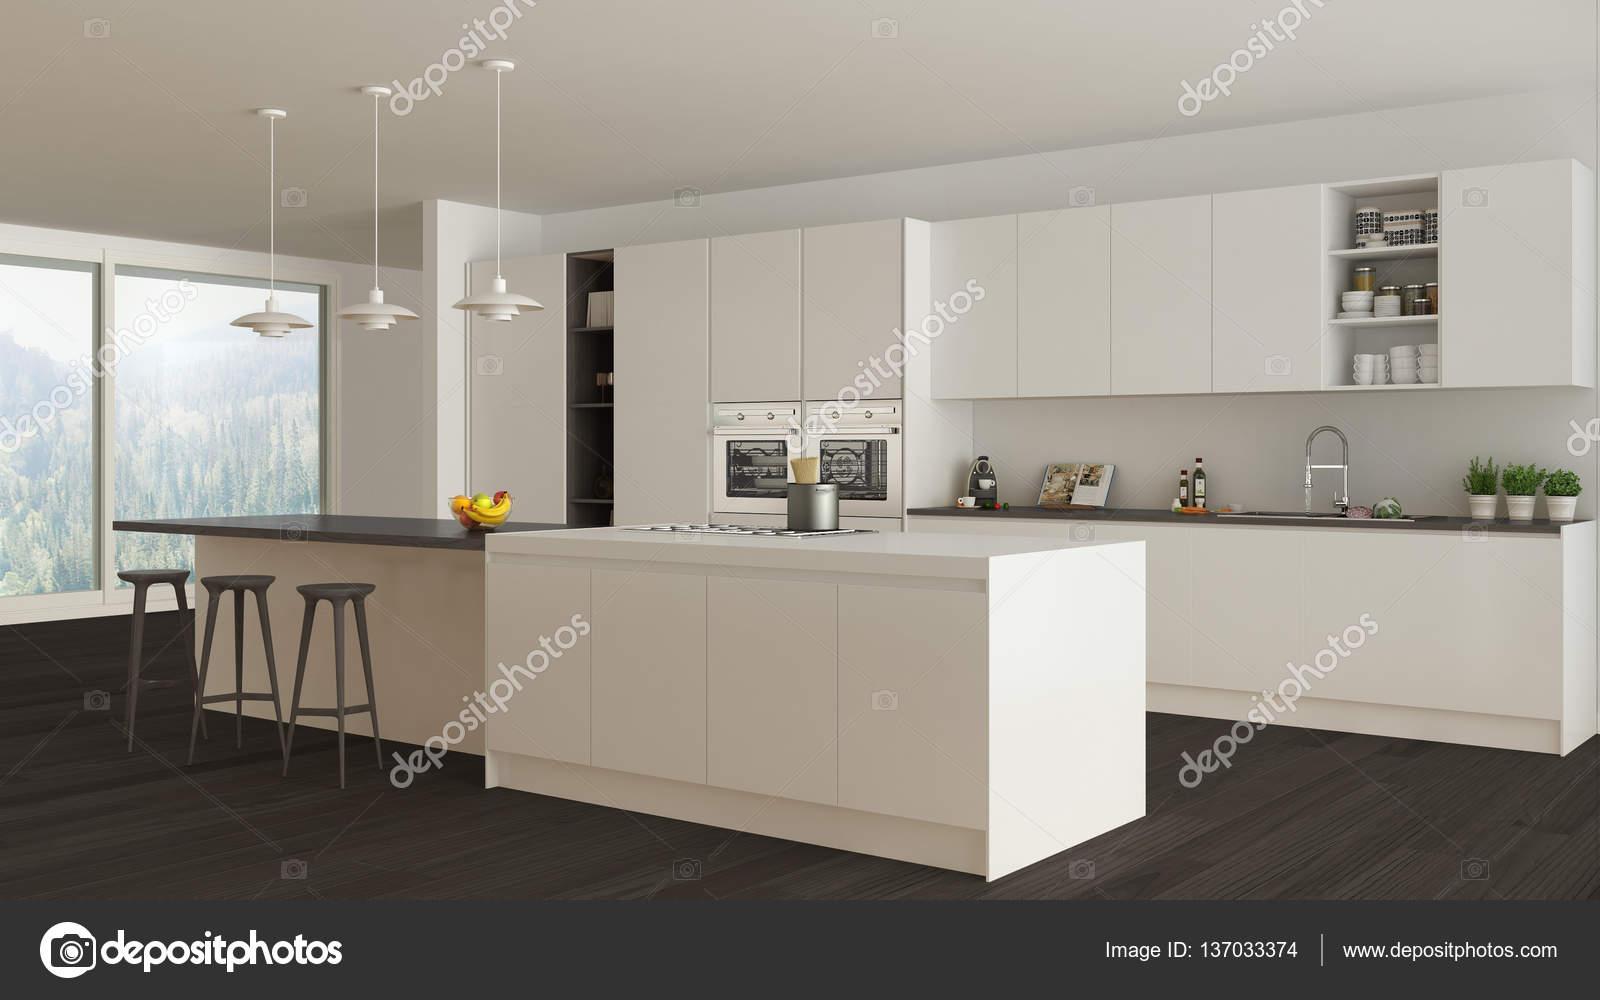 Cucina scandinava bianca con dettagli in legno e bianchi ...